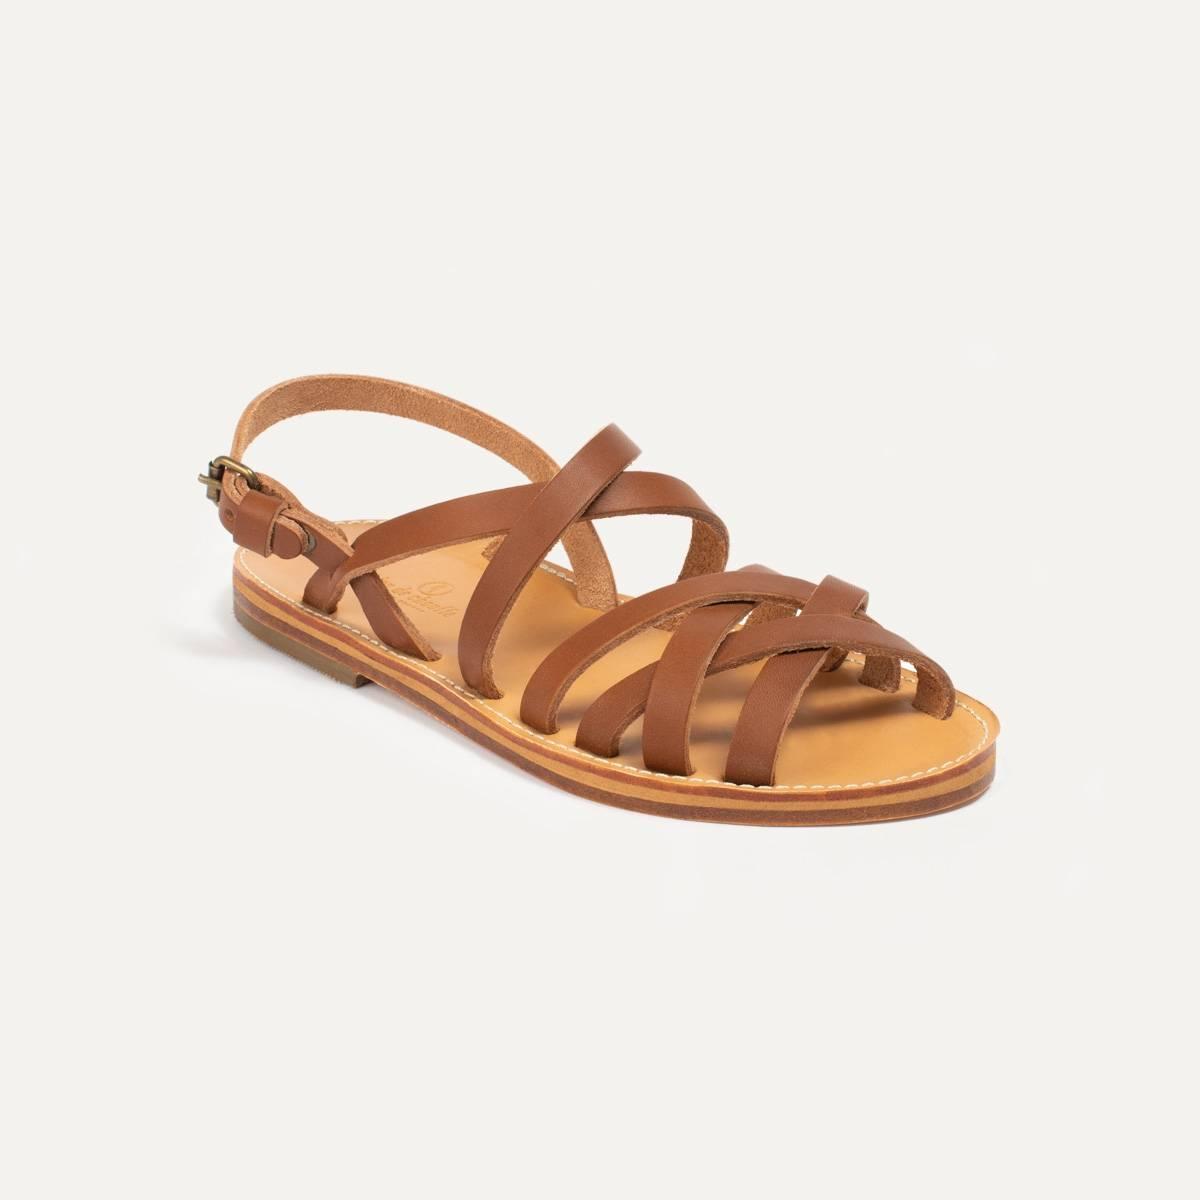 Sandales cuir Majour - Pain Brûlé (image n°2)